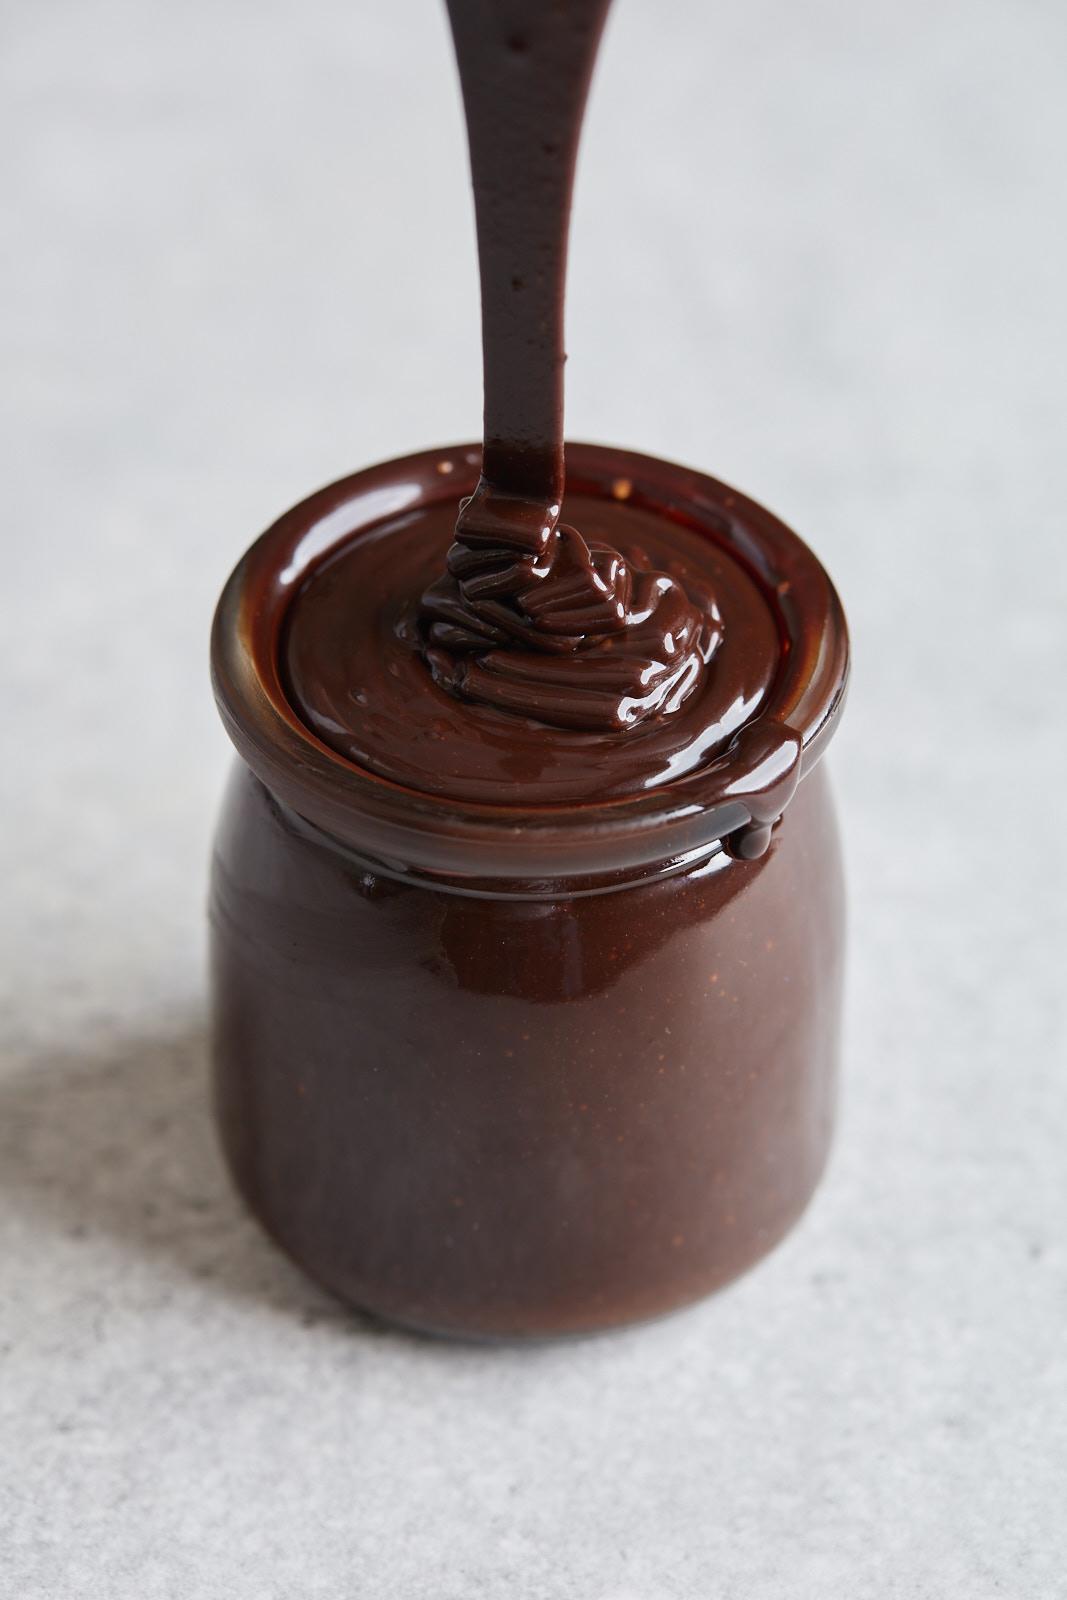 Easy Homemade Hot Fudge Sauce